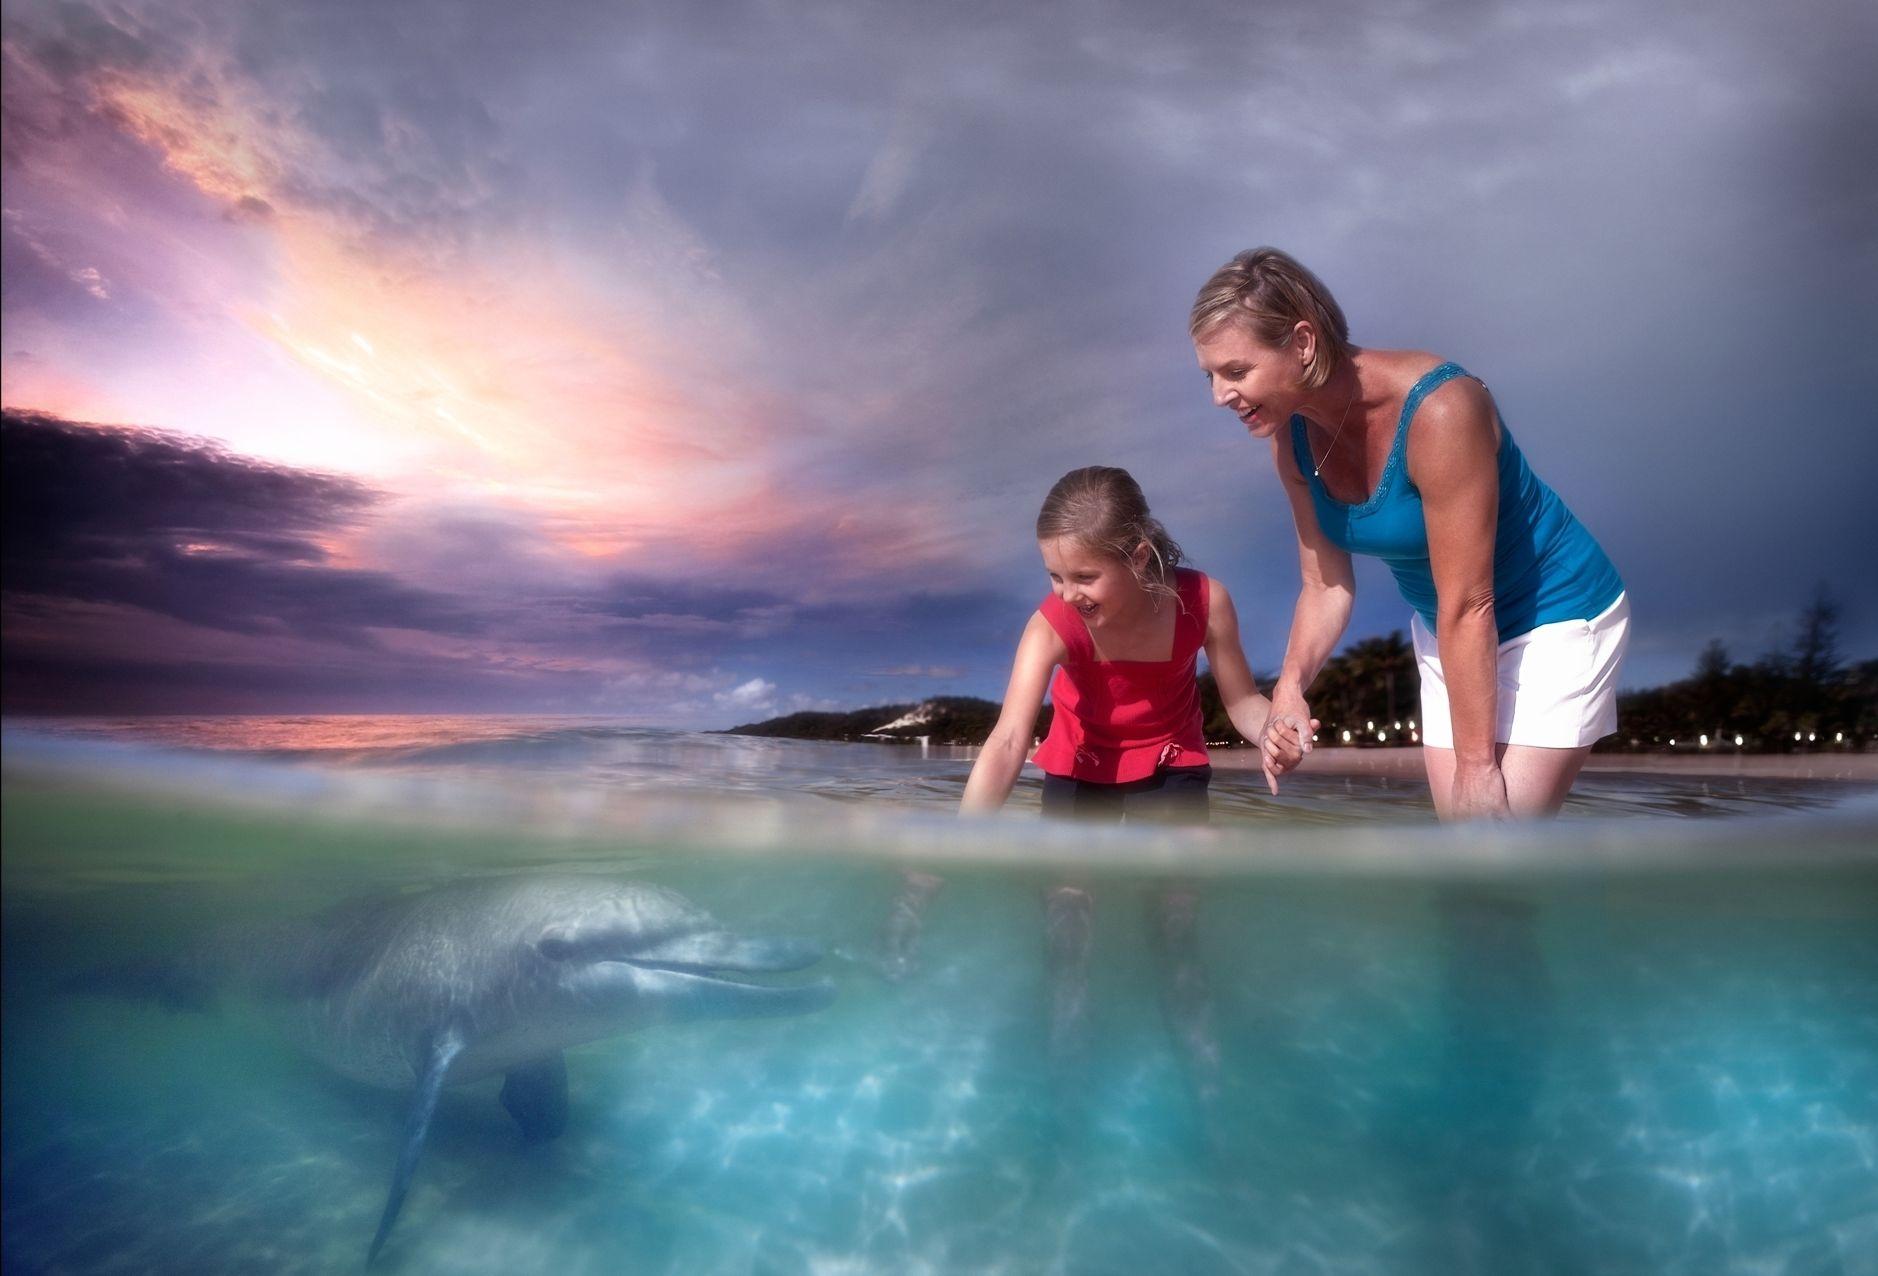 Dolphin feeding comp dusk landscape v2.jpg